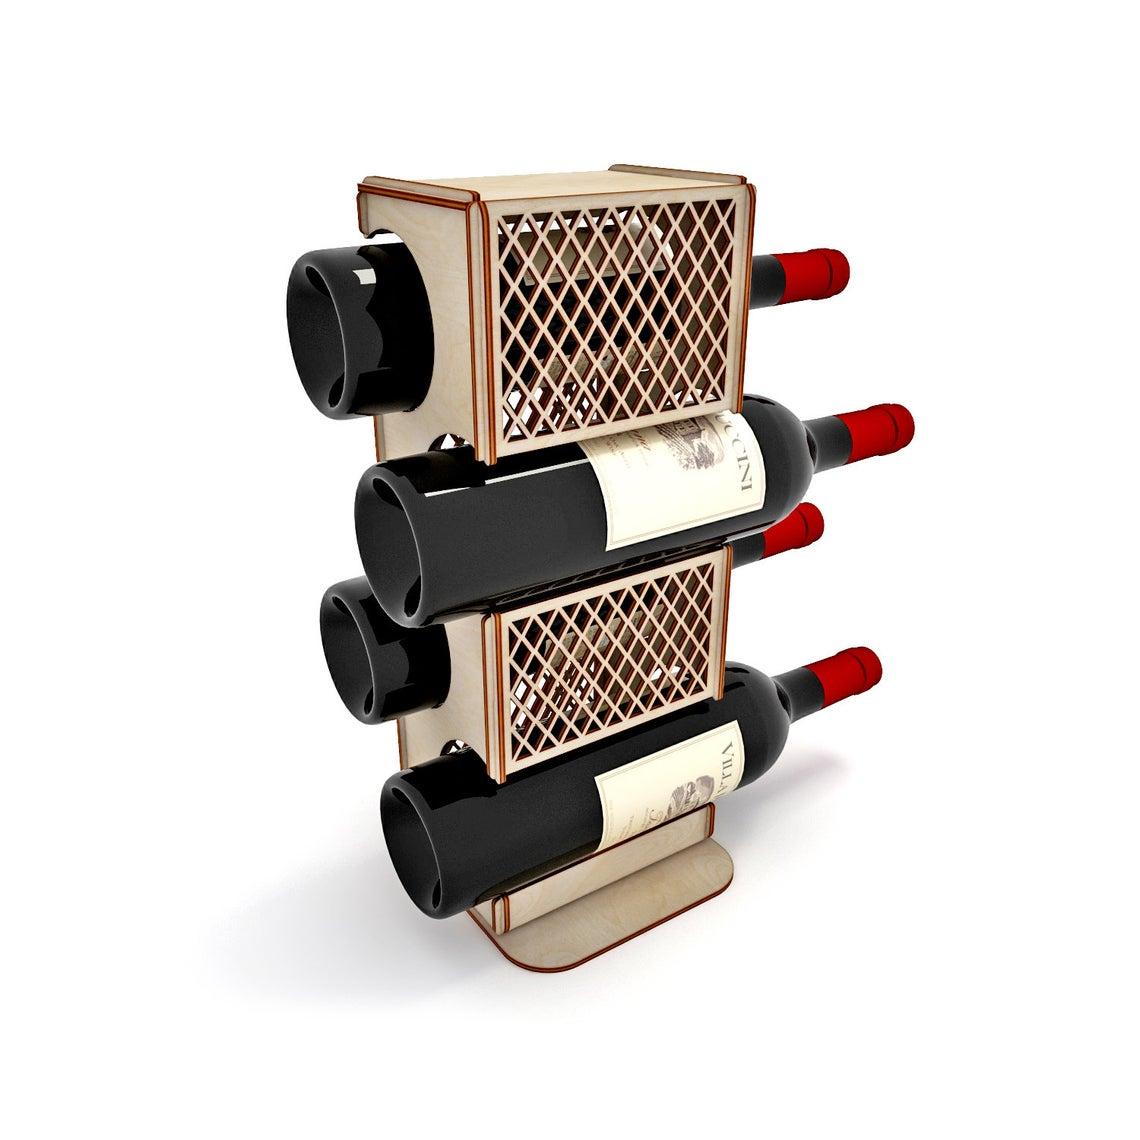 Laser Cut Wooden Wine Rack Wine Holder Wine Bottle Stand Display Stand Free Vector